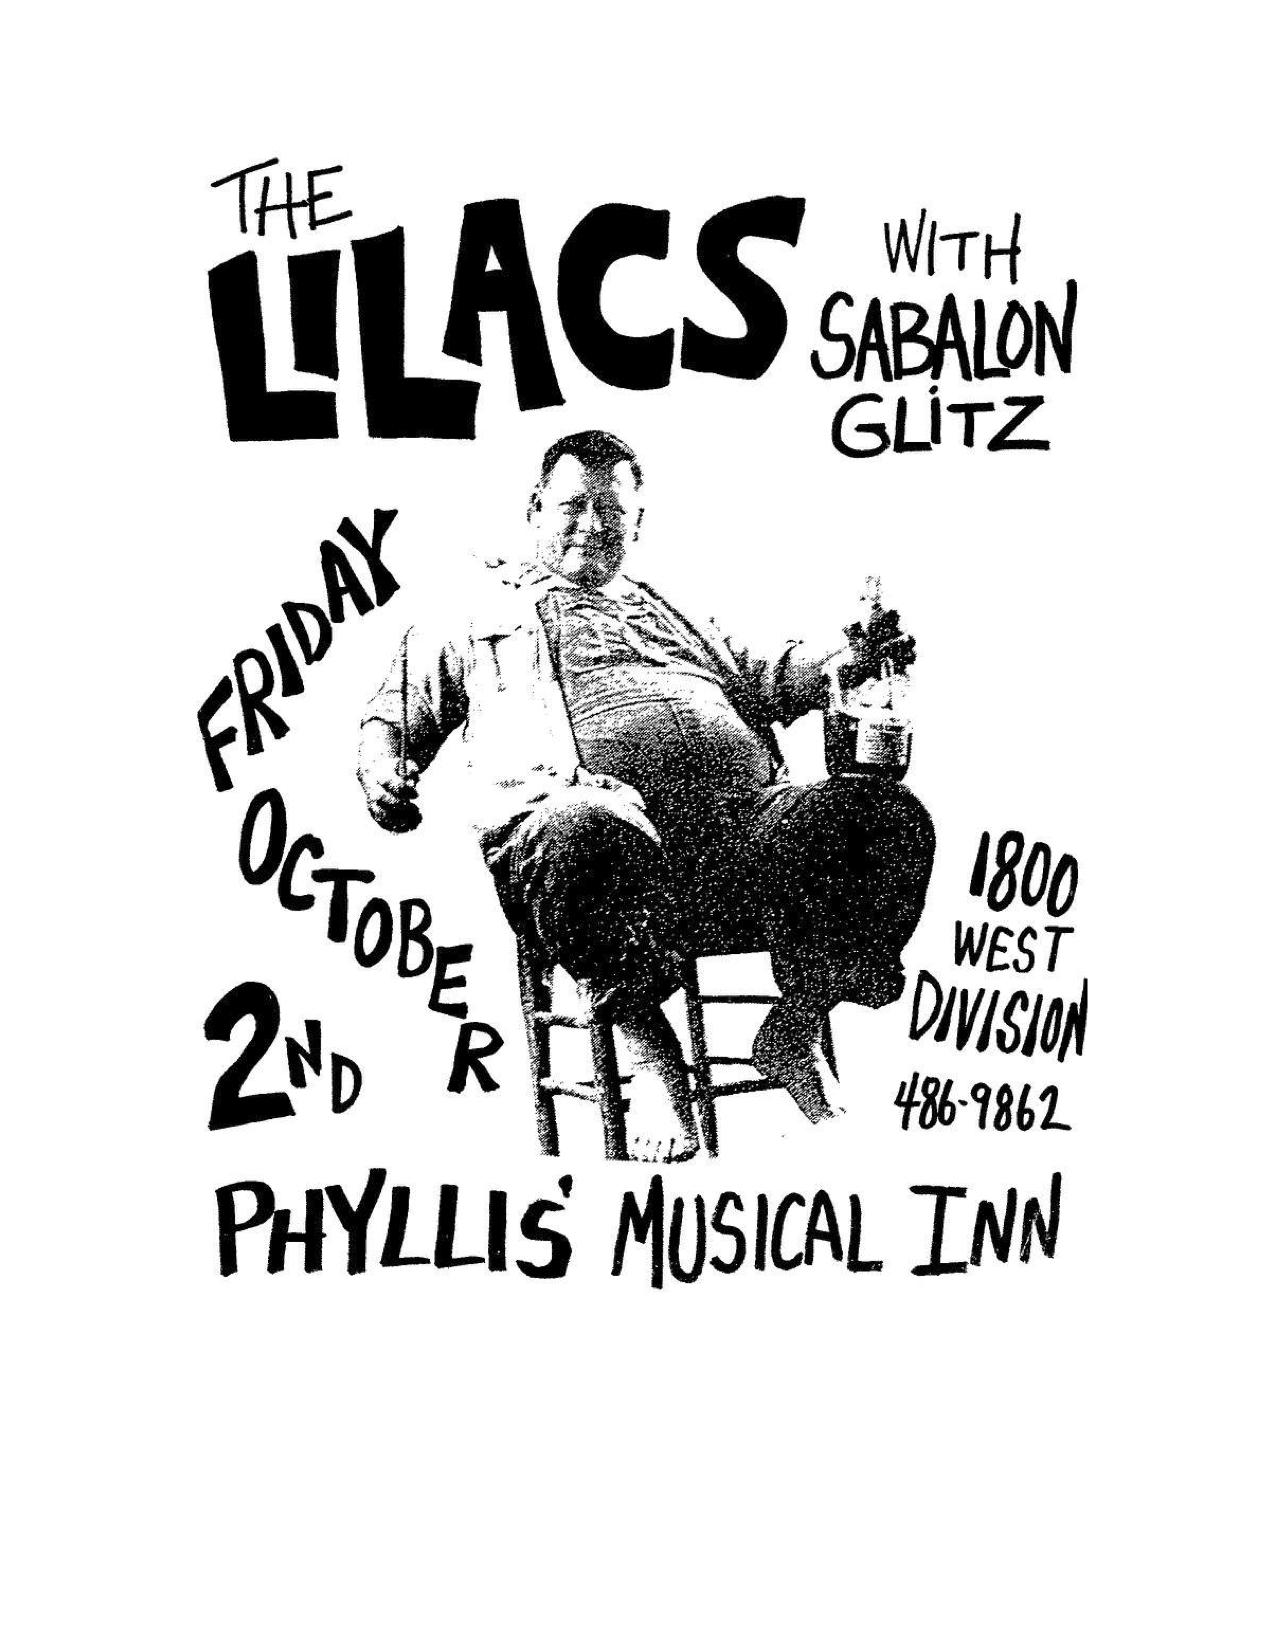 The Lilacs Poster 25 (Sabalon Glitz).jpg